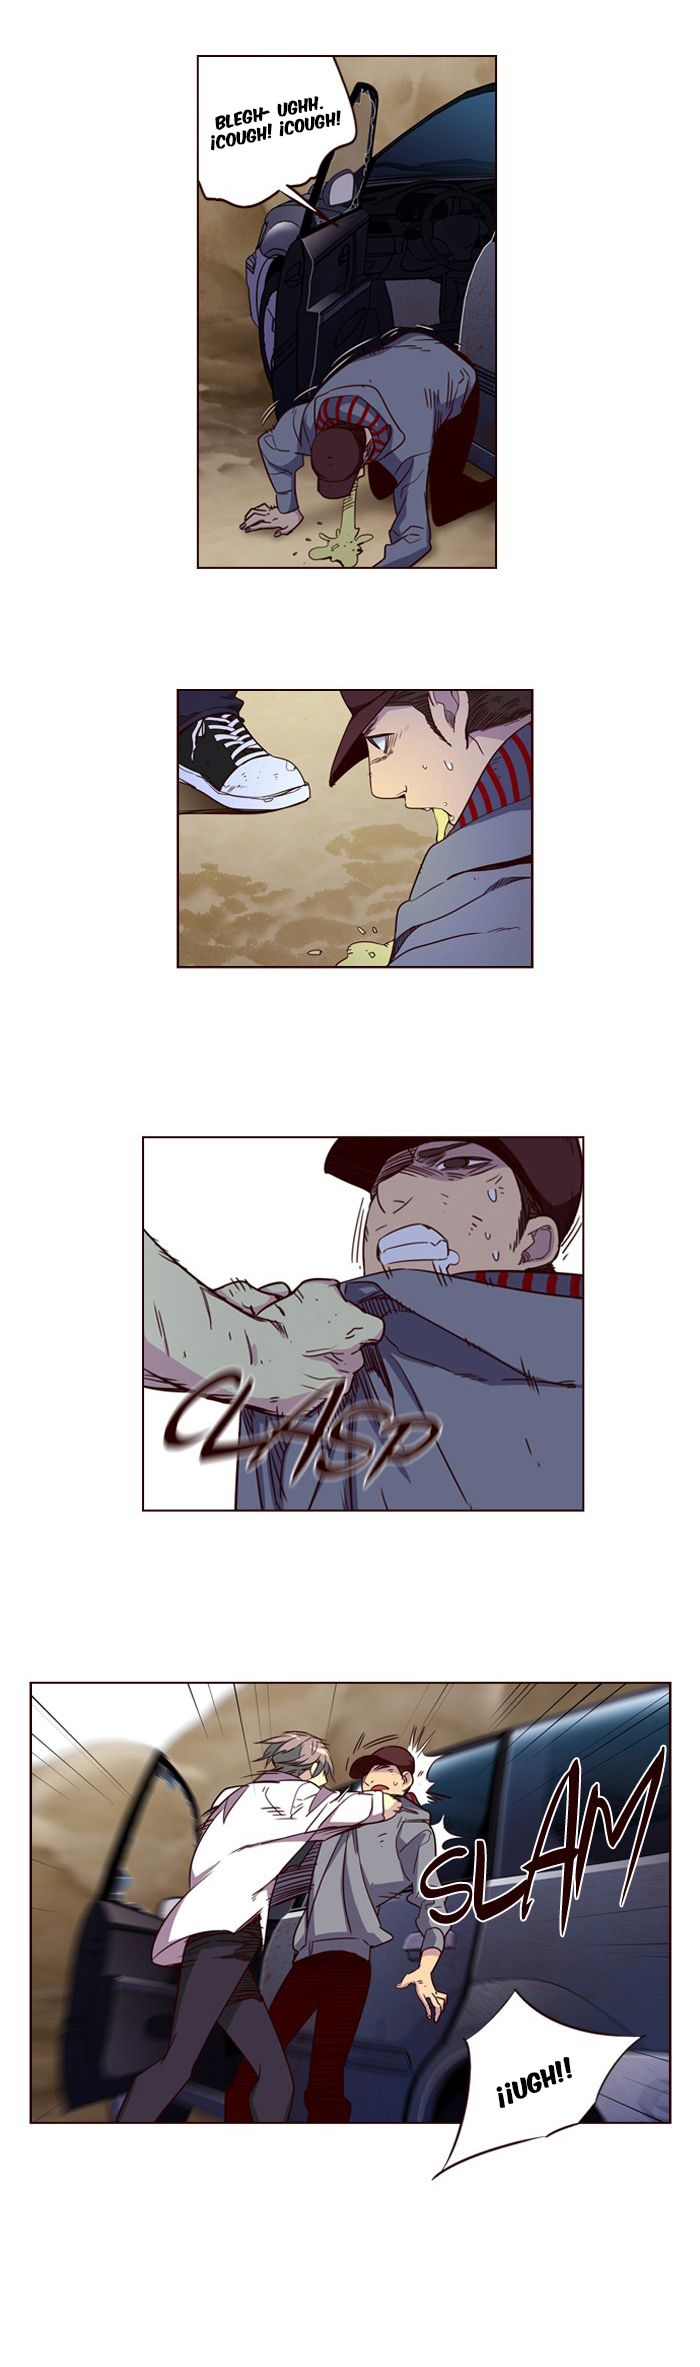 http://c5.ninemanga.com/es_manga/32/416/477195/3470cc035465574839a94ca1ded4cfbb.jpg Page 10